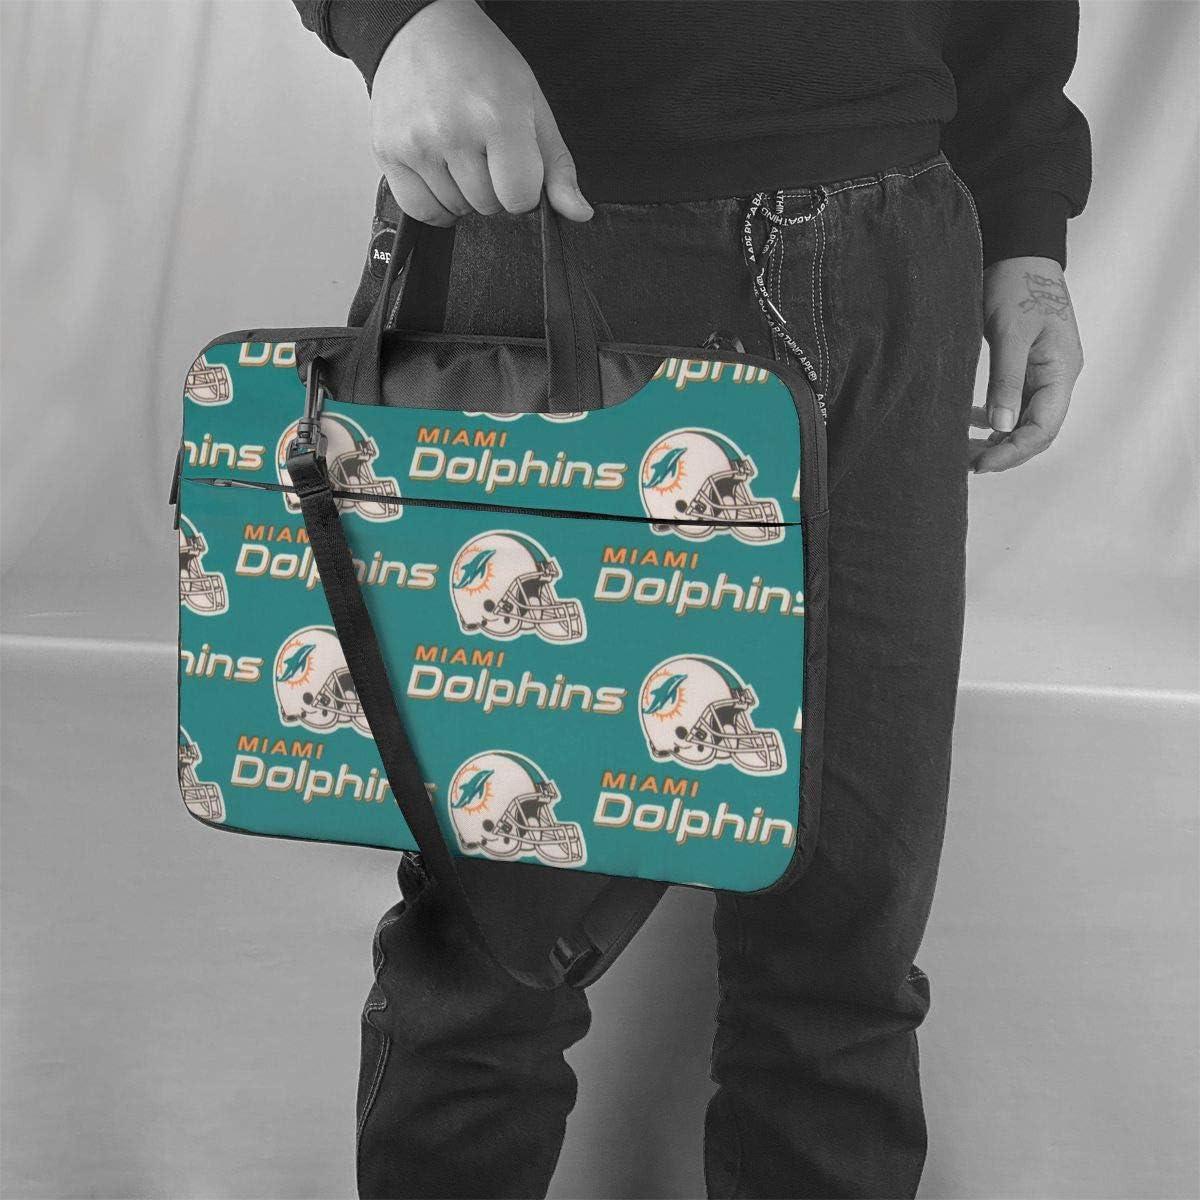 ALHOKLAus Mia-mi Dol-phins Stylish Customized Laptop Bag, Portable Shoulder Bag, Crossbody Bag and Briefcase (3 Sizes)